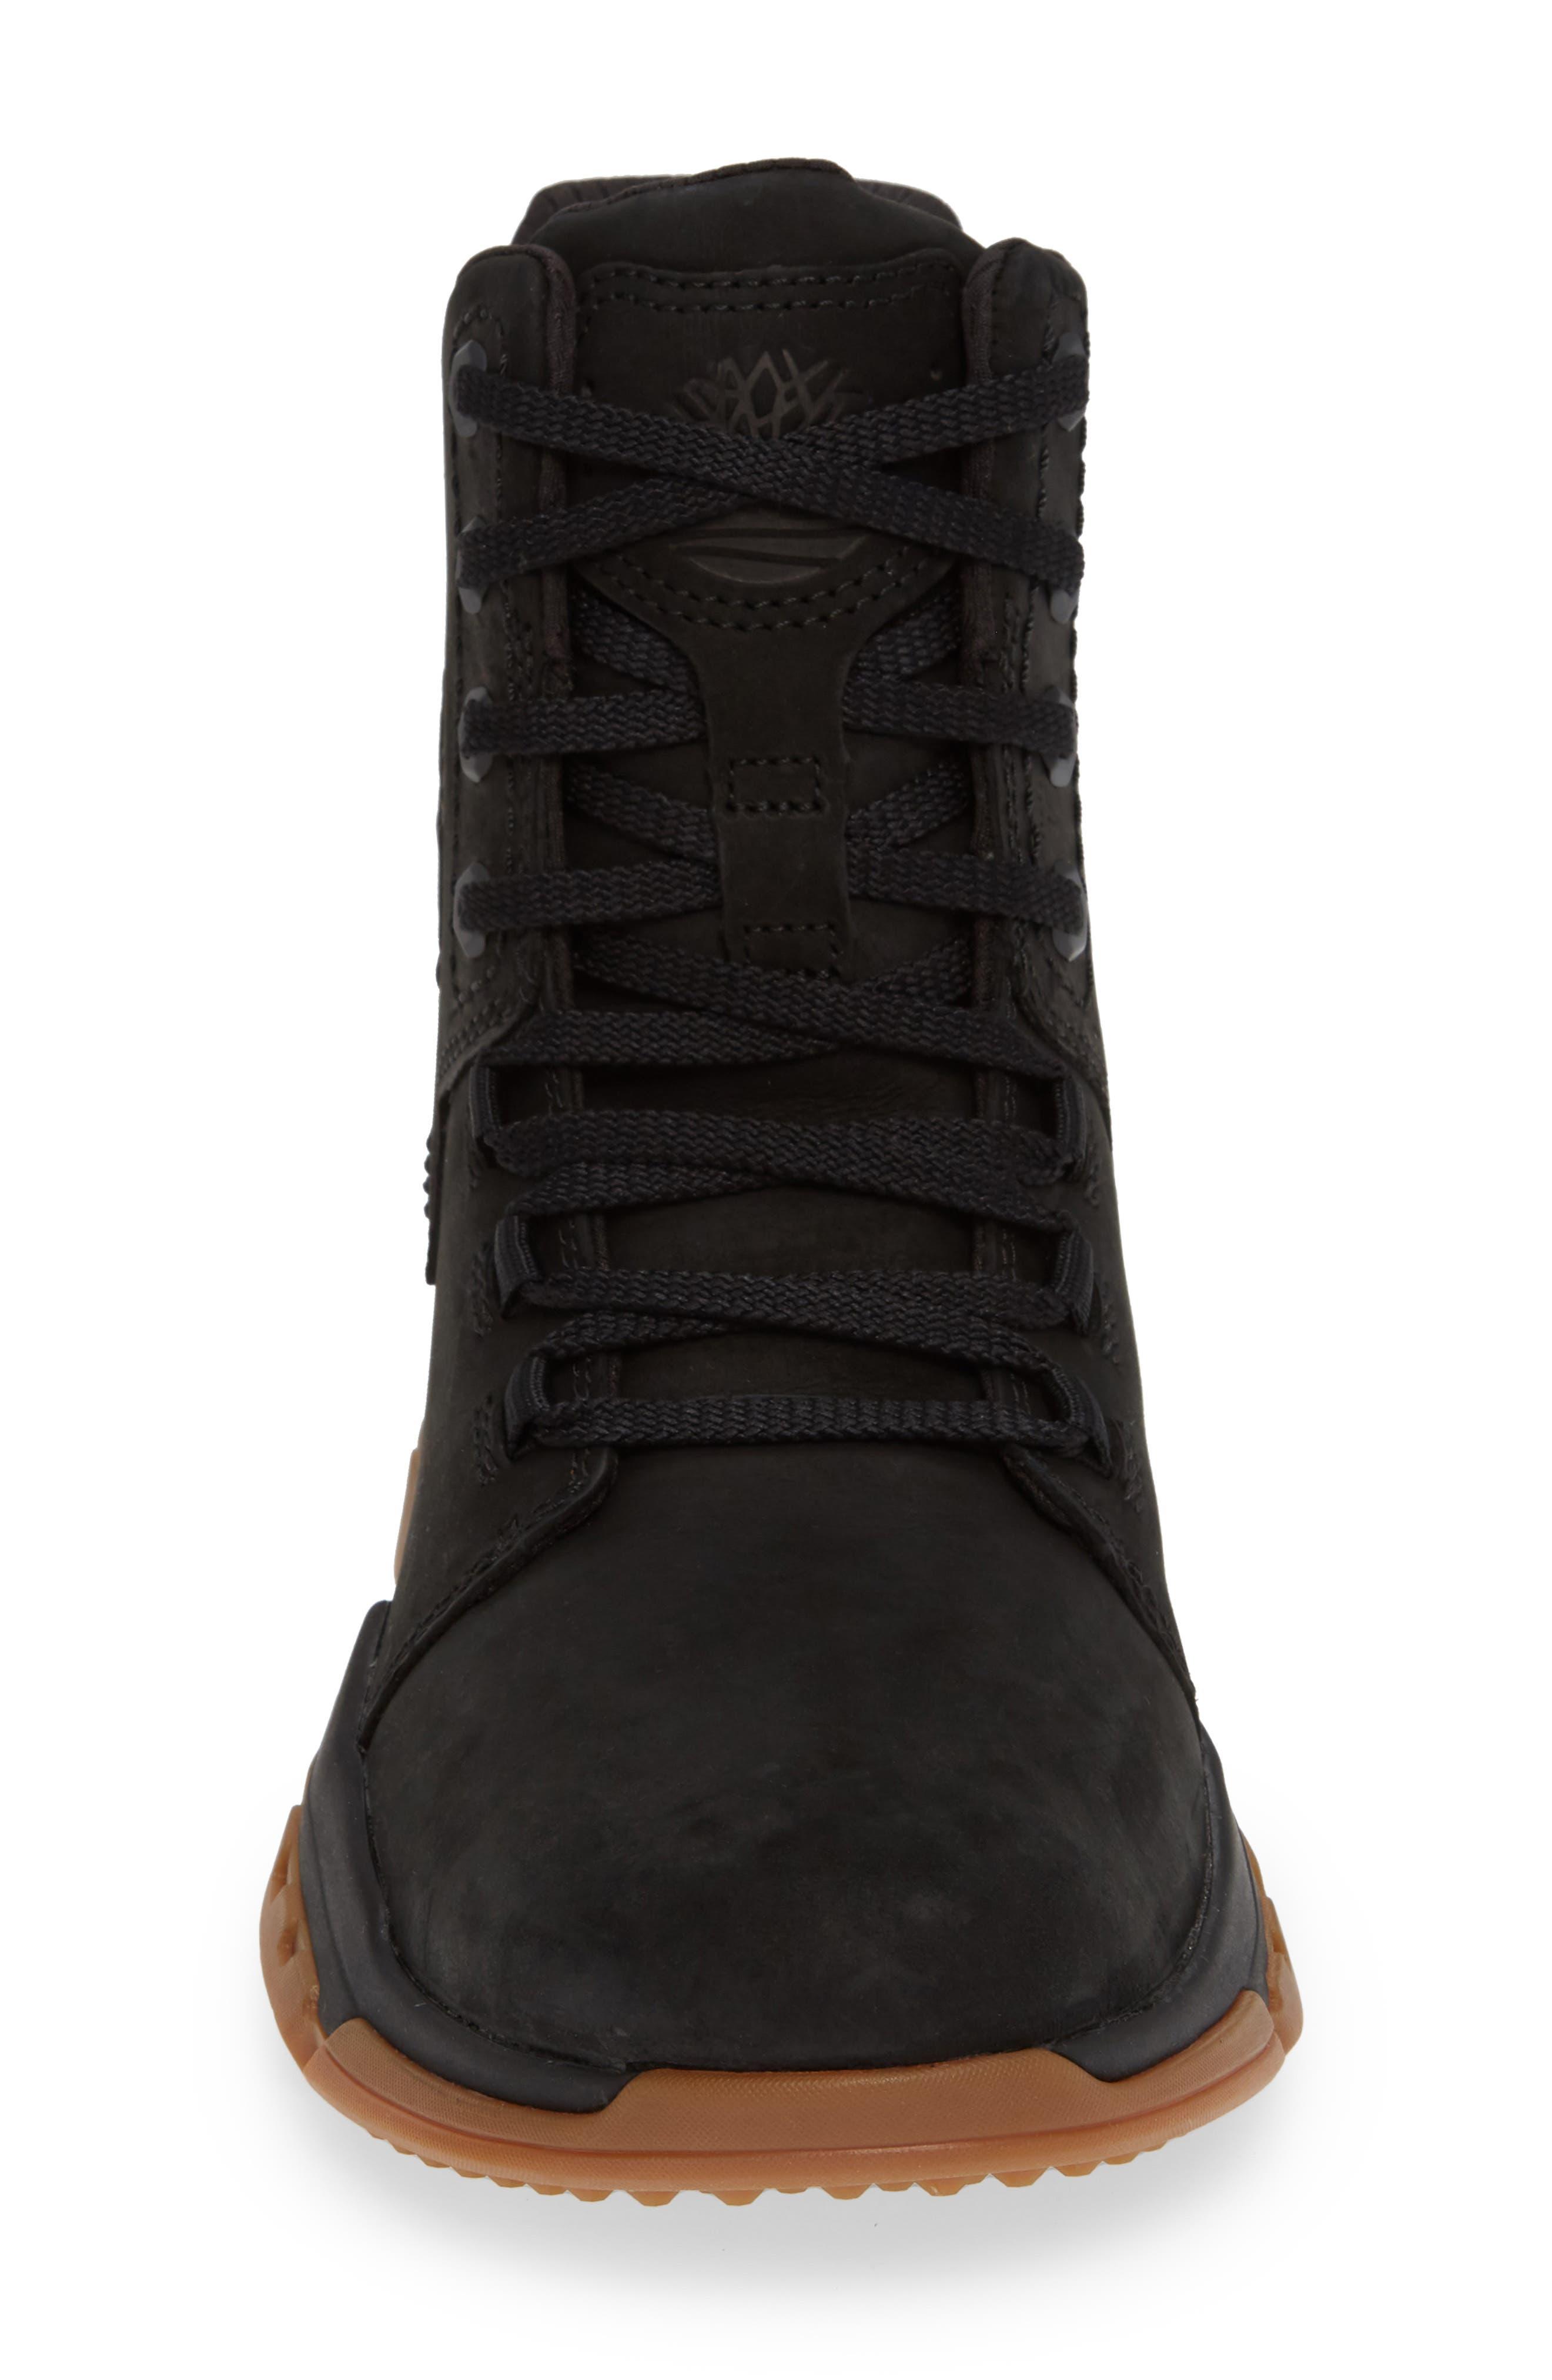 City Force Reveal Plain Toe Boot,                             Alternate thumbnail 4, color,                             BLACK LEATHER/ NEOPRENE